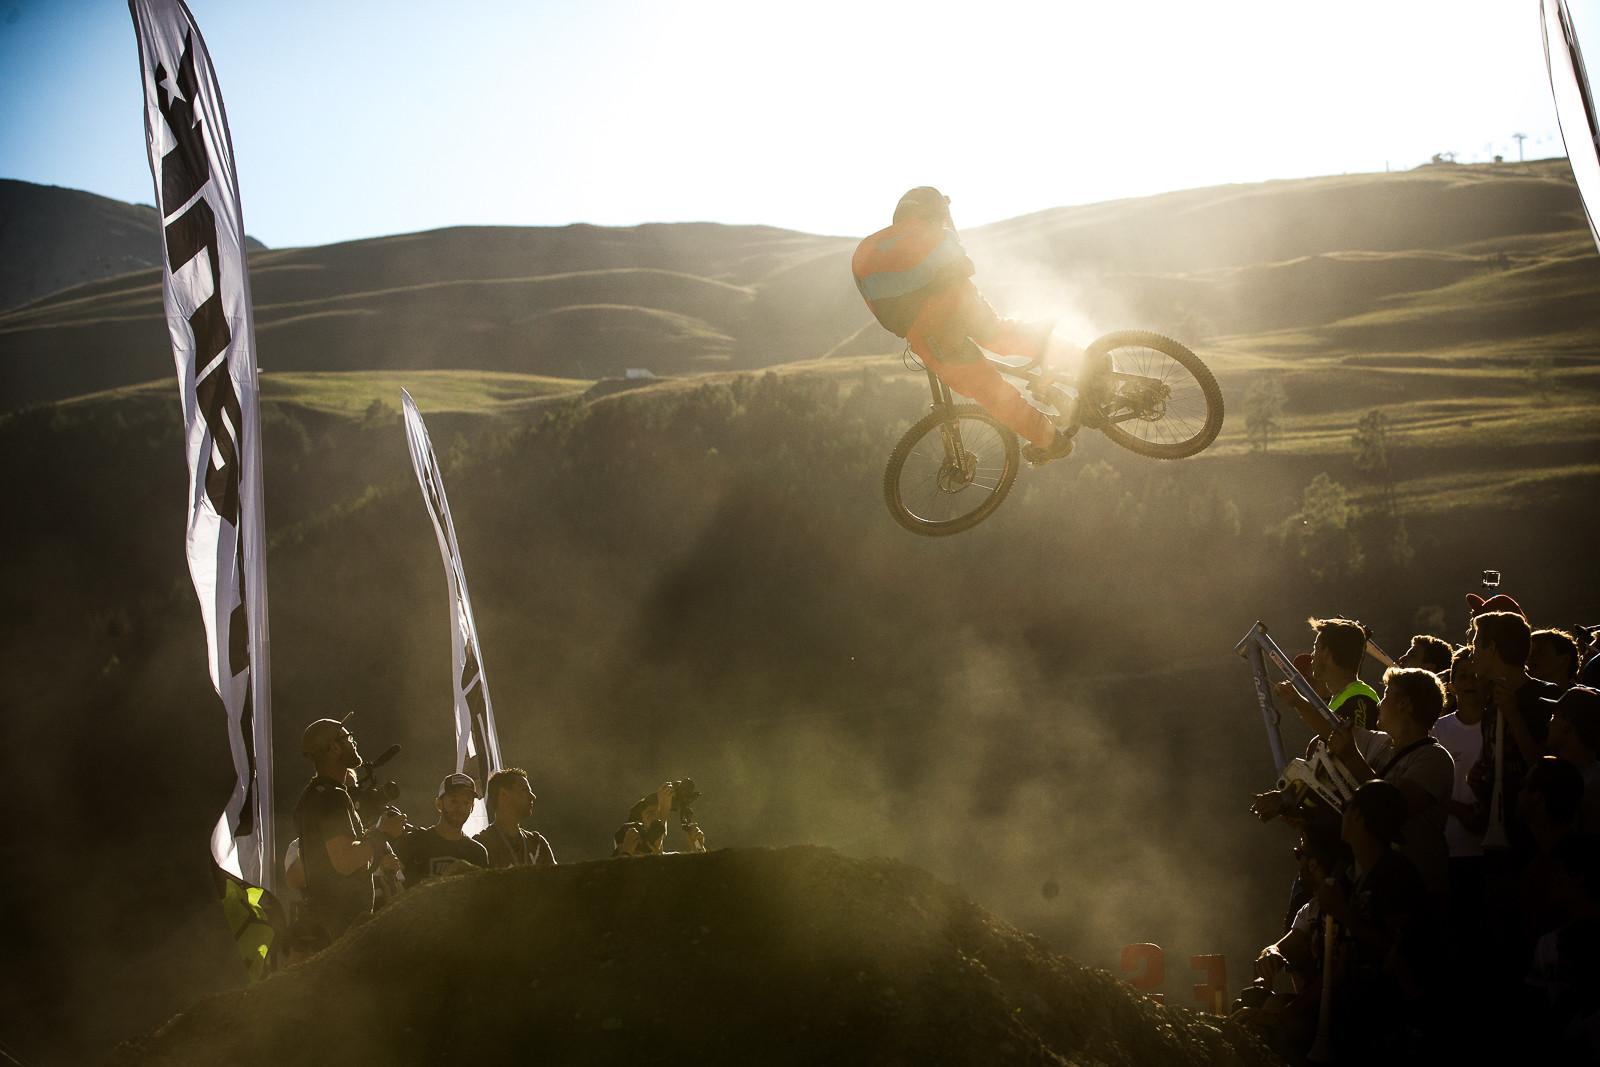 Blazing, Whip Off European Champs, Crankworx L2A - Whip Off European Champs, Crankworx L2A - Mountain Biking Pictures - Vital MTB